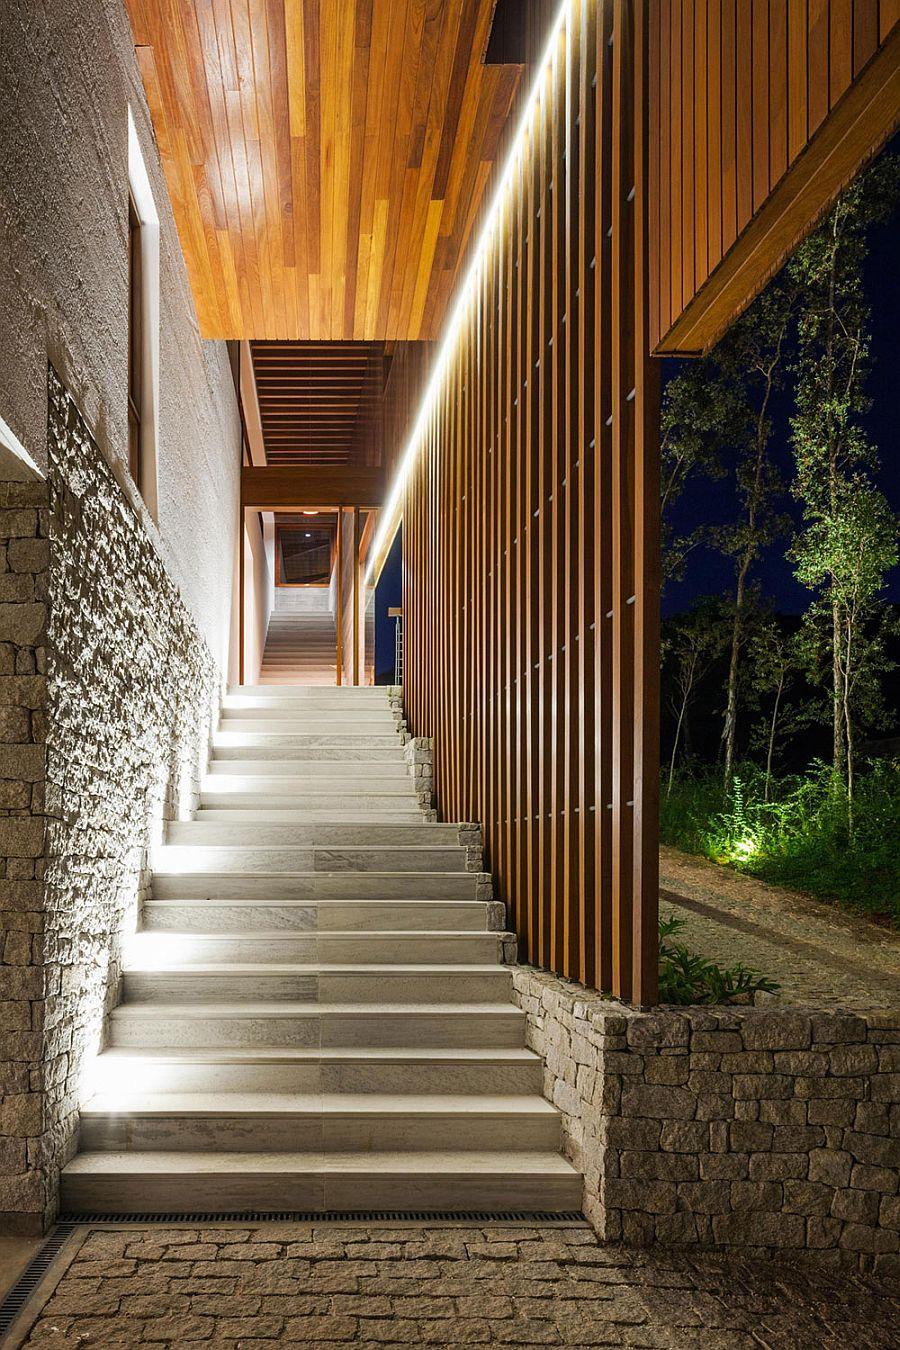 Beautiful lighting illuminates the stairway leading to the Brazilian home